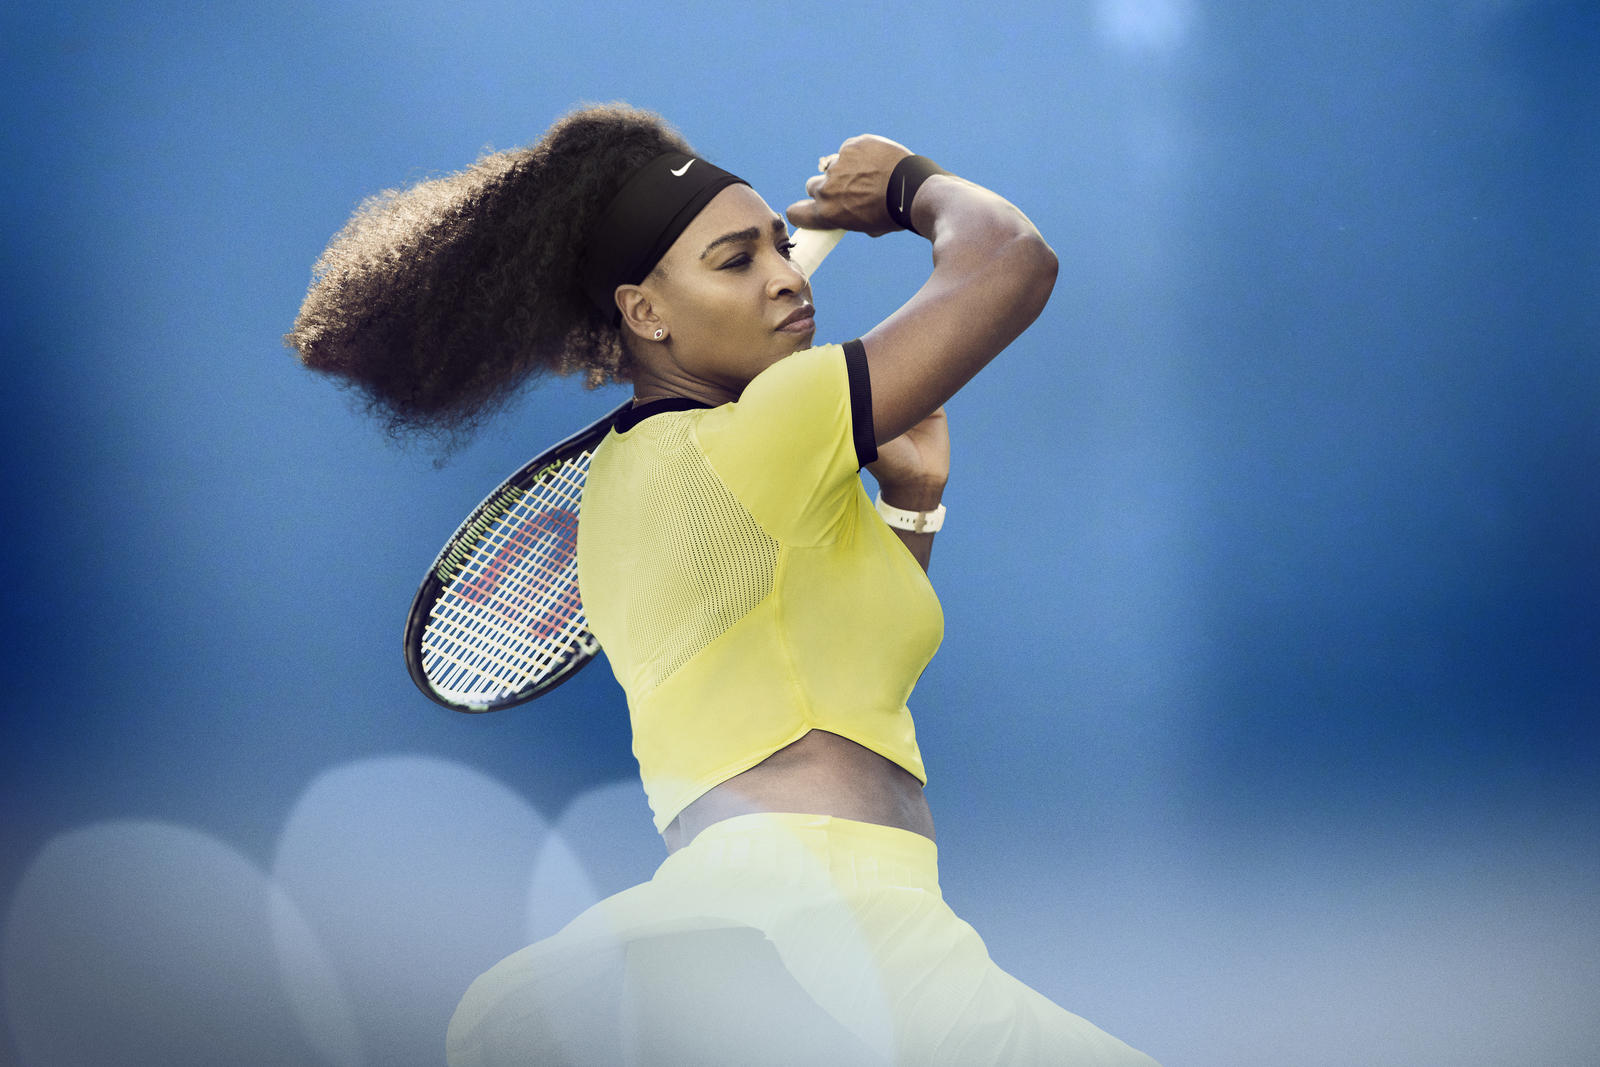 Serena Williams nike tennis outfit australian open 2016